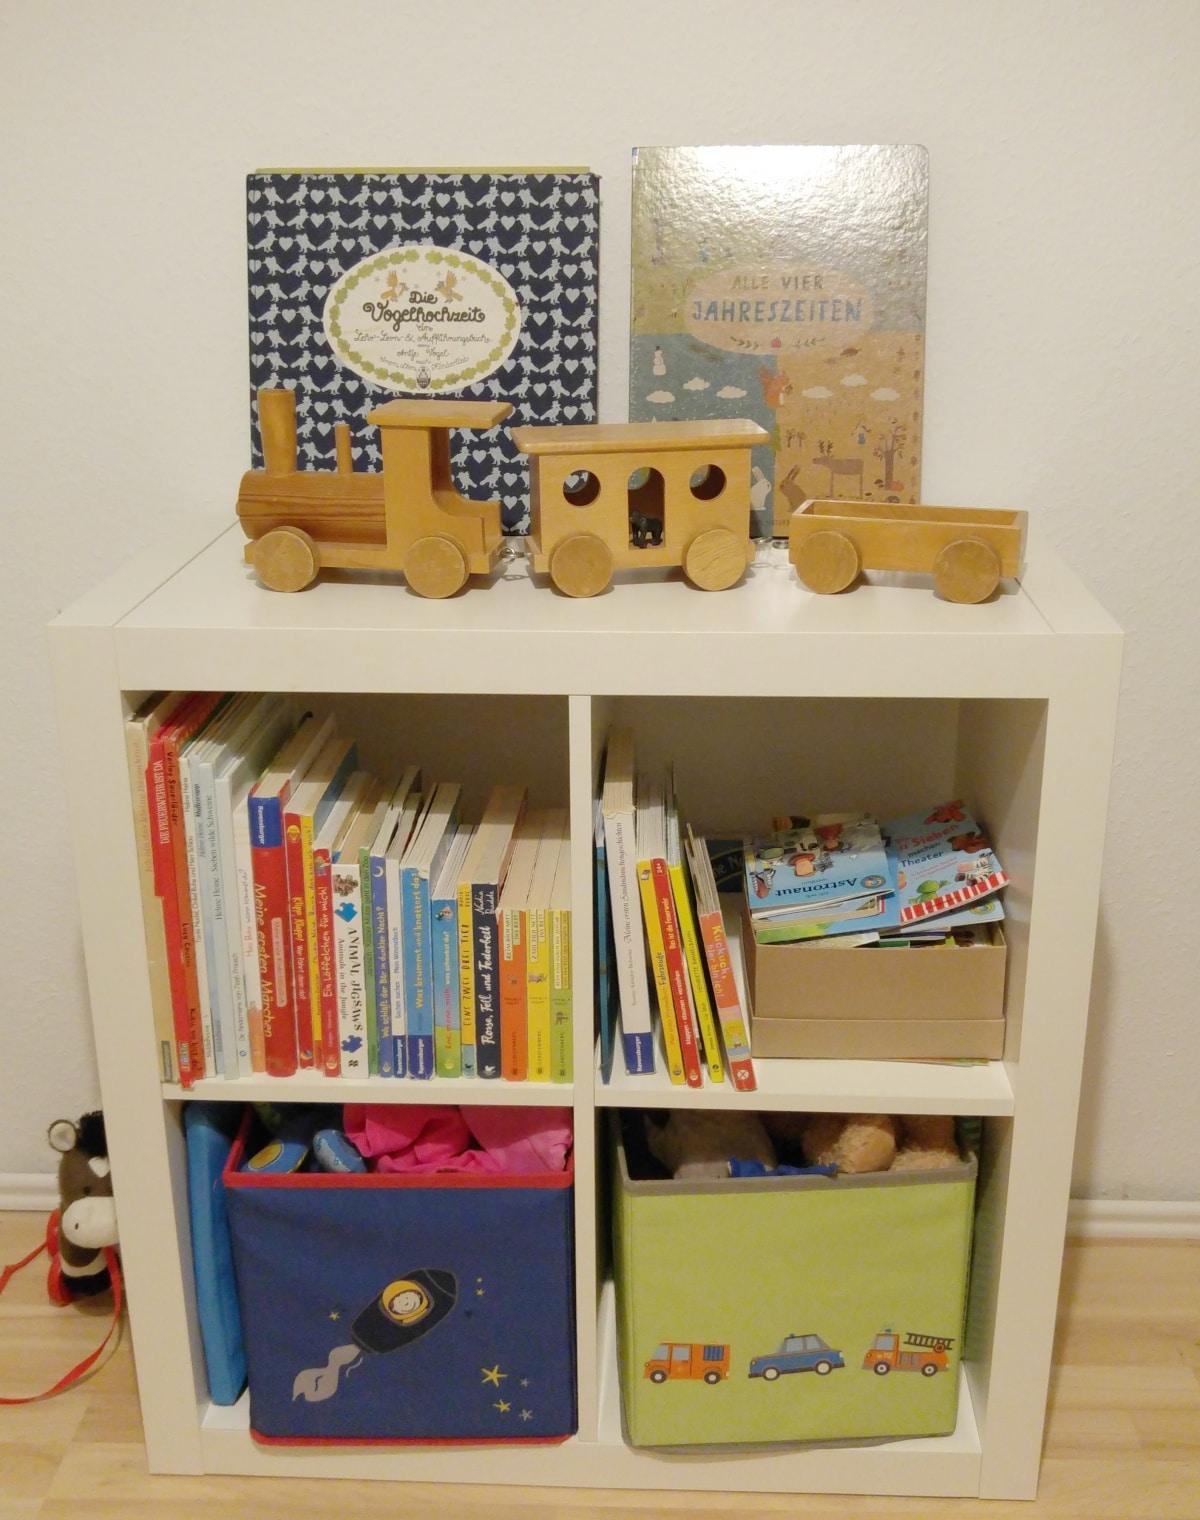 Full Size of Bücherregal Kinderzimmer Sofa Regal Regale Weiß Kinderzimmer Bücherregal Kinderzimmer